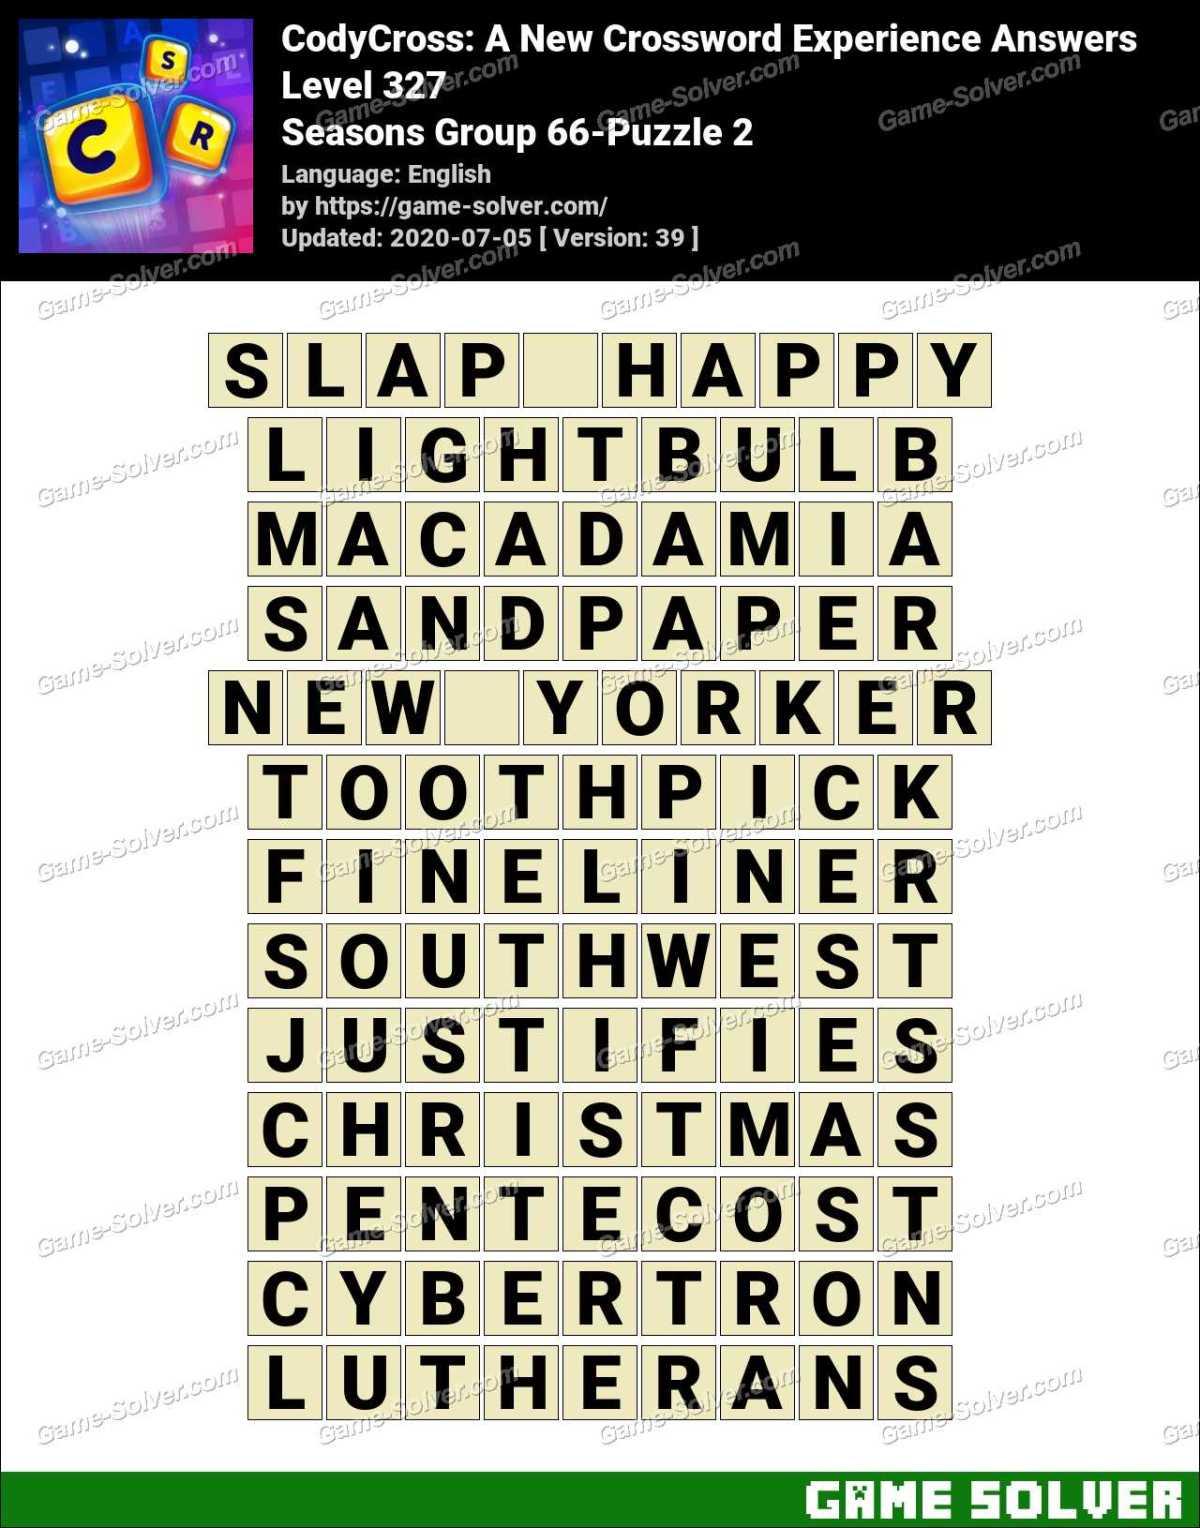 CodyCross Seasons Group 66-Puzzle 2 Answers